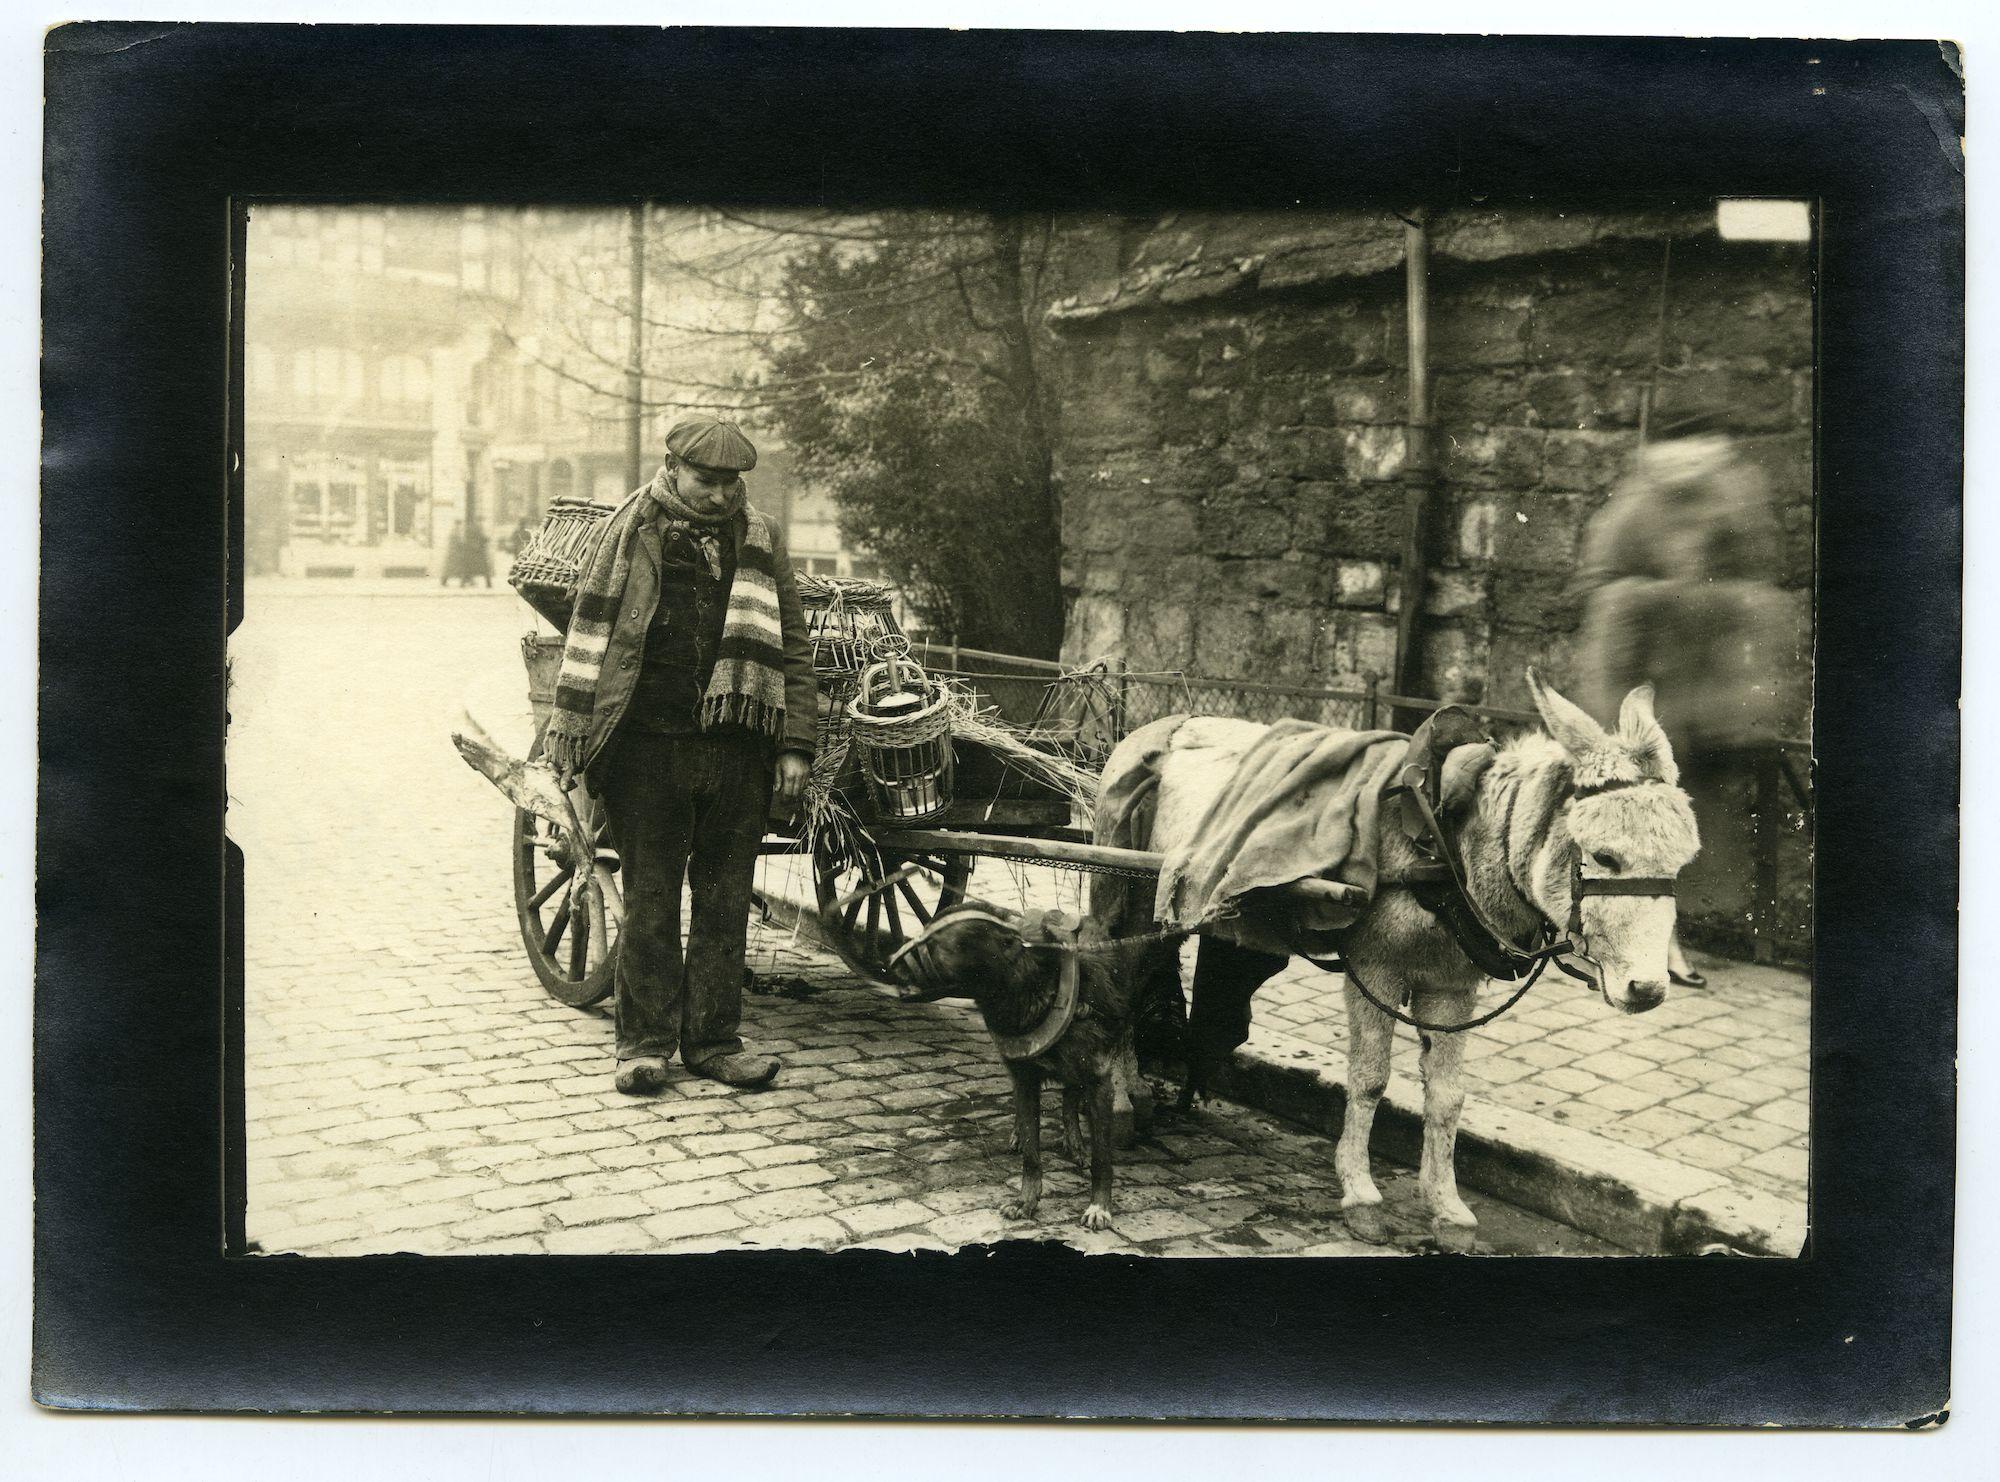 Gent: Goudenleeuwplein - Emile Braunplein: poelier met ezelkar en hond, 1915-1916